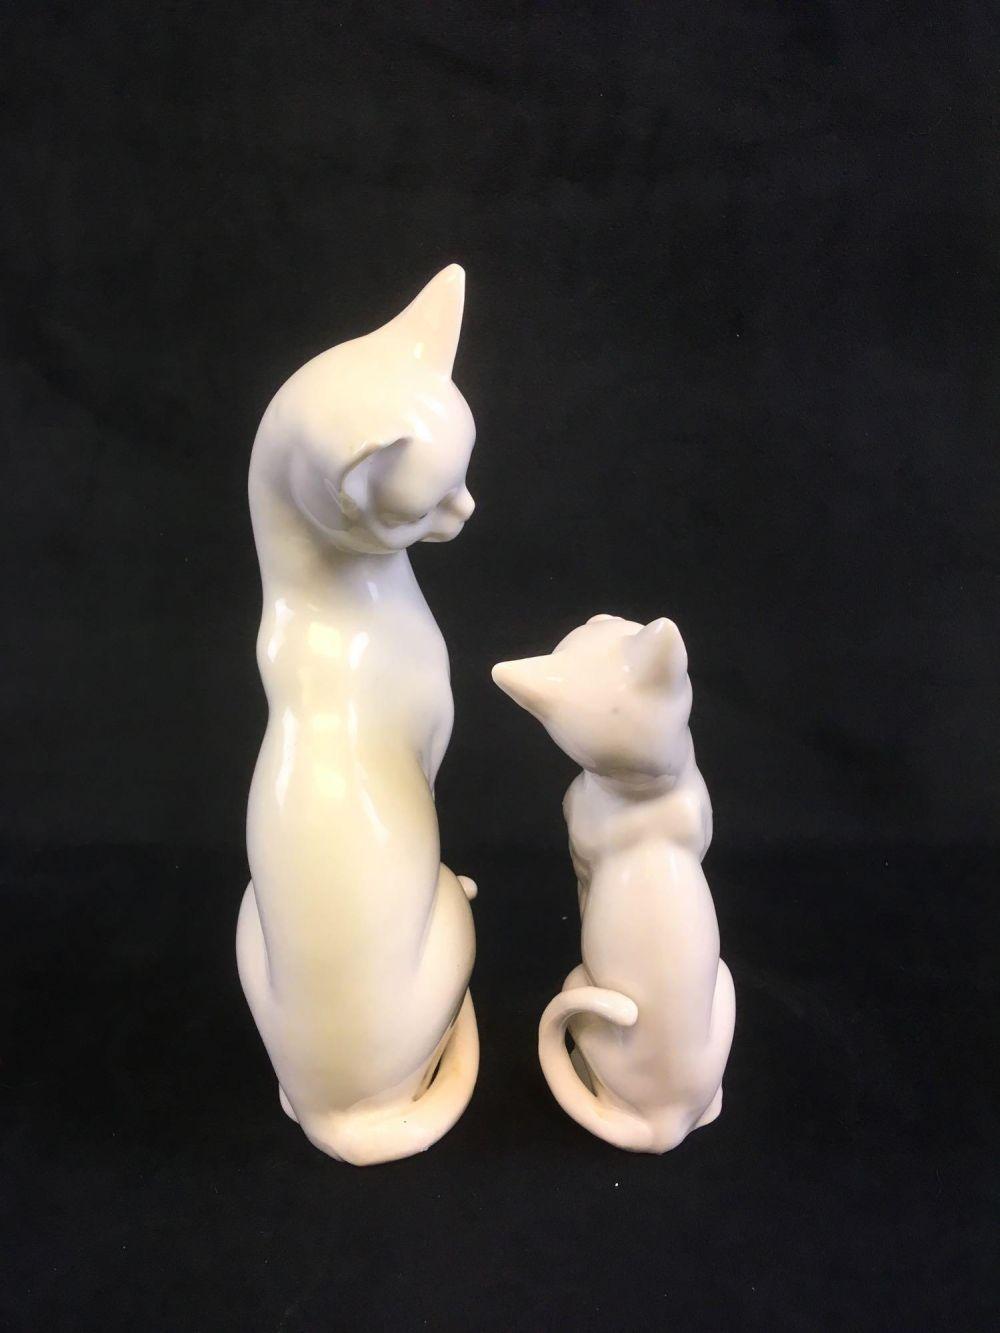 Lot 660: A Pair of Vintage PorcelainCat Figurines Marked Adalt Japan